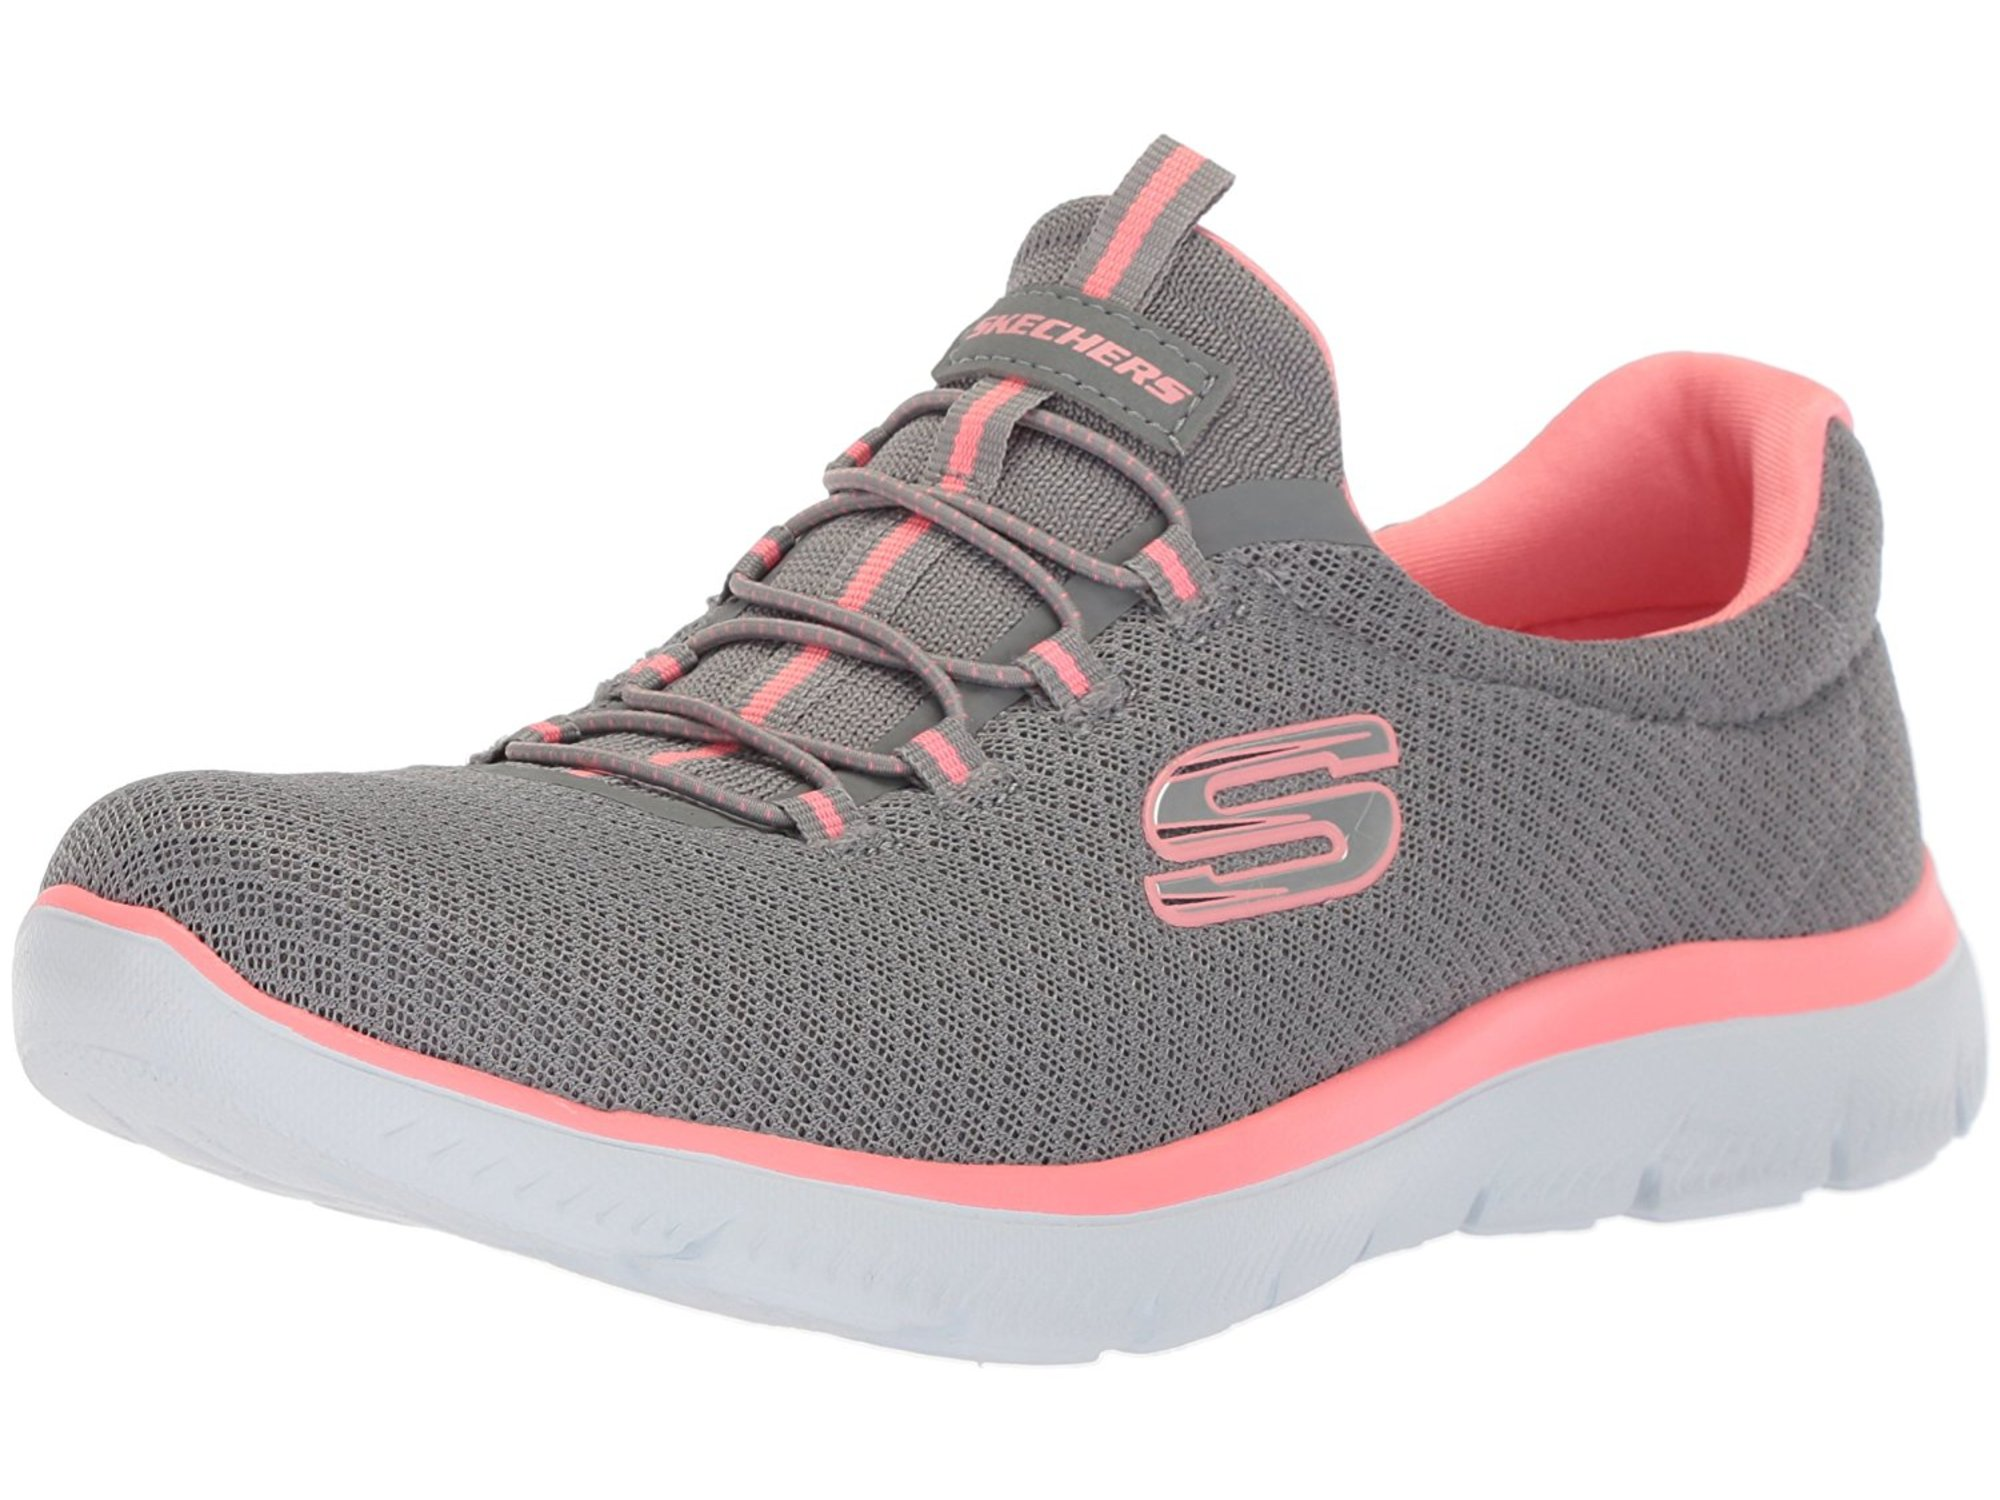 Skechers Summits Training Sneakers